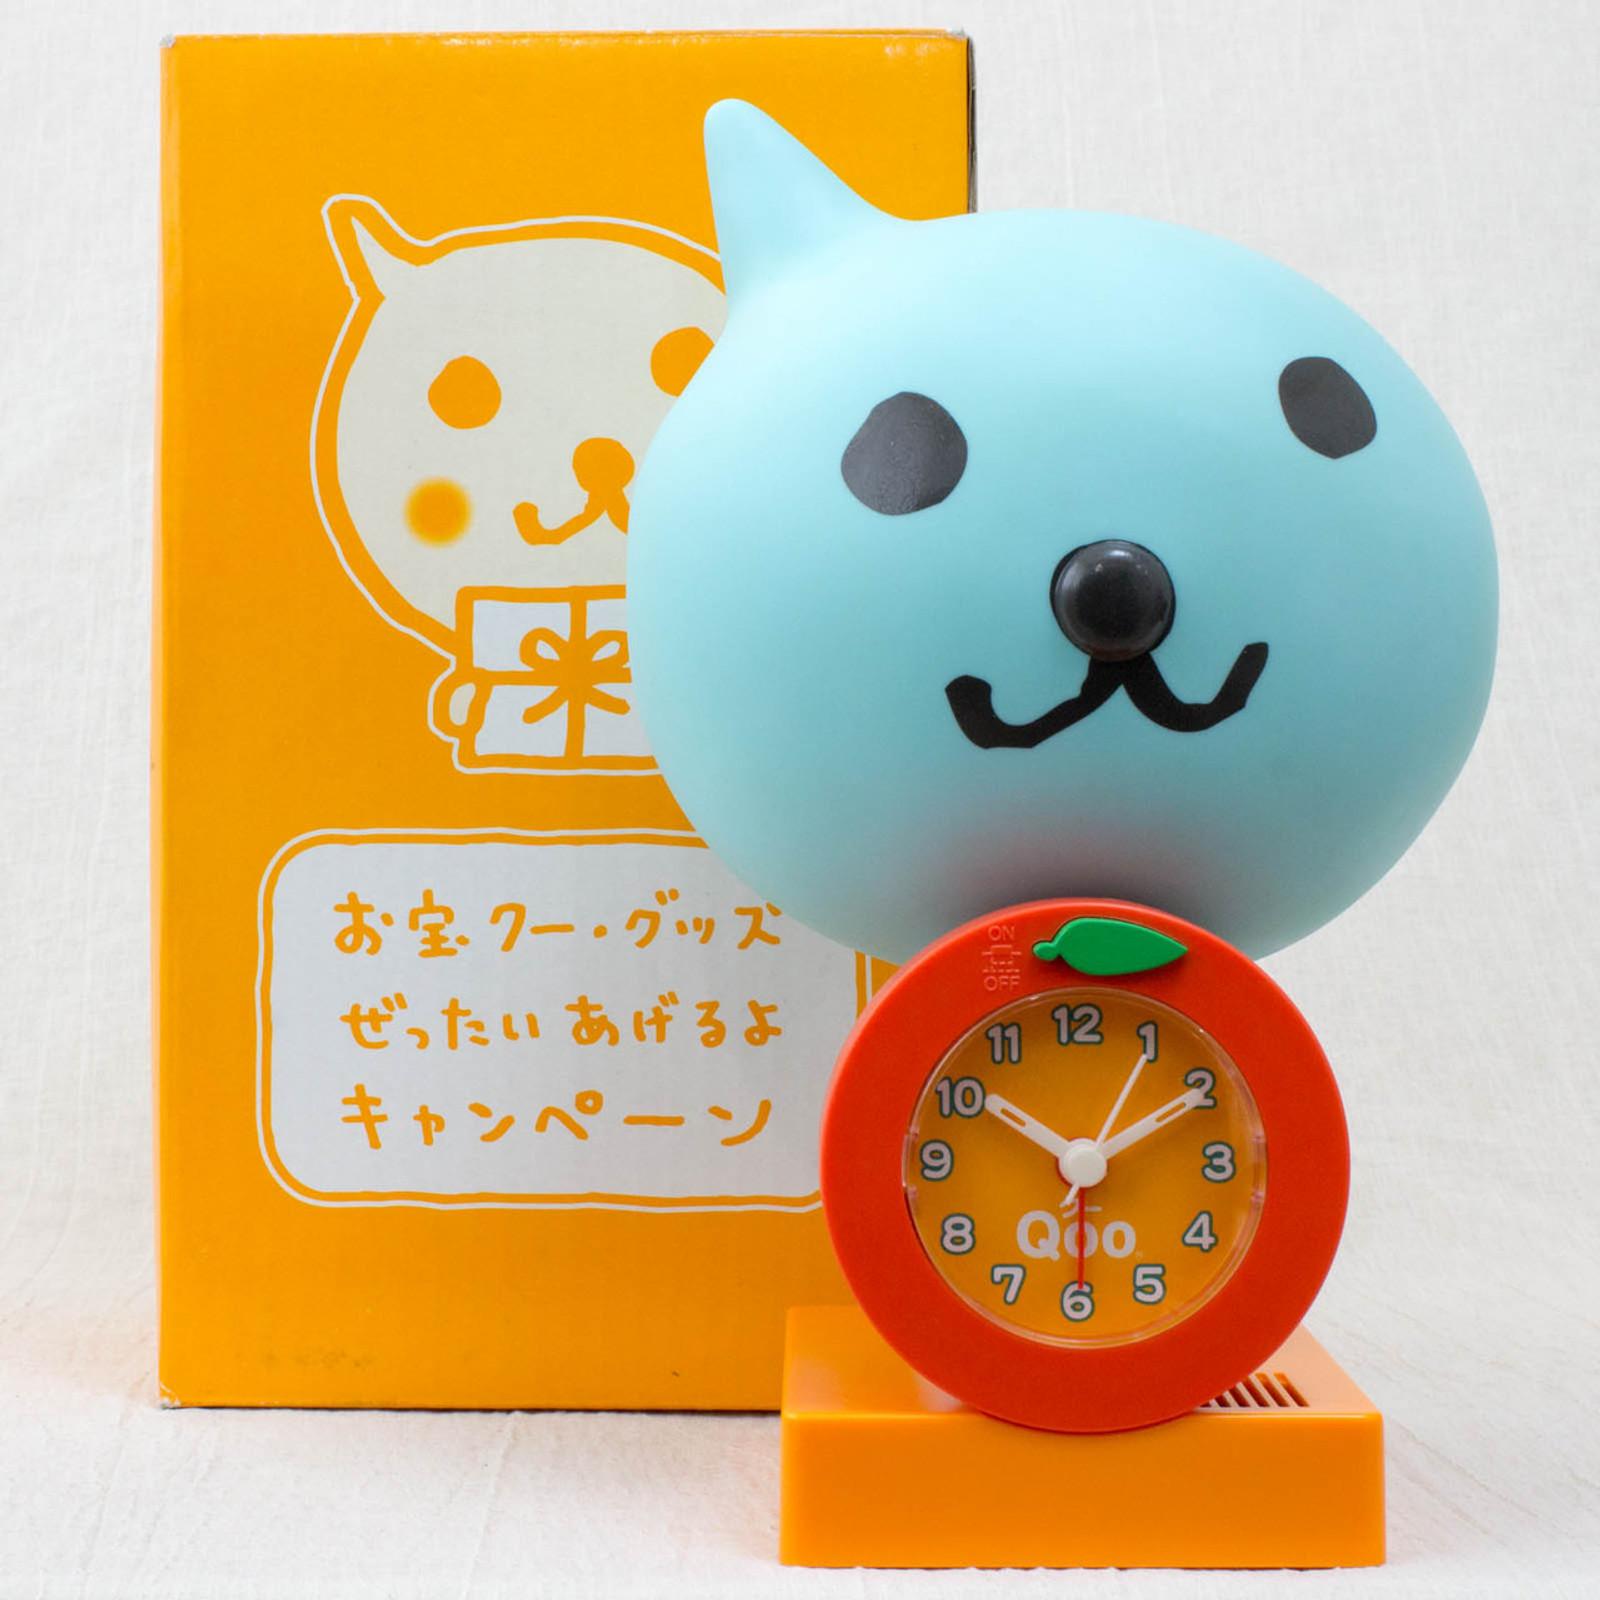 QOO Music Singing Alarm Clock Figure Coca-Cola Japan Limited Product